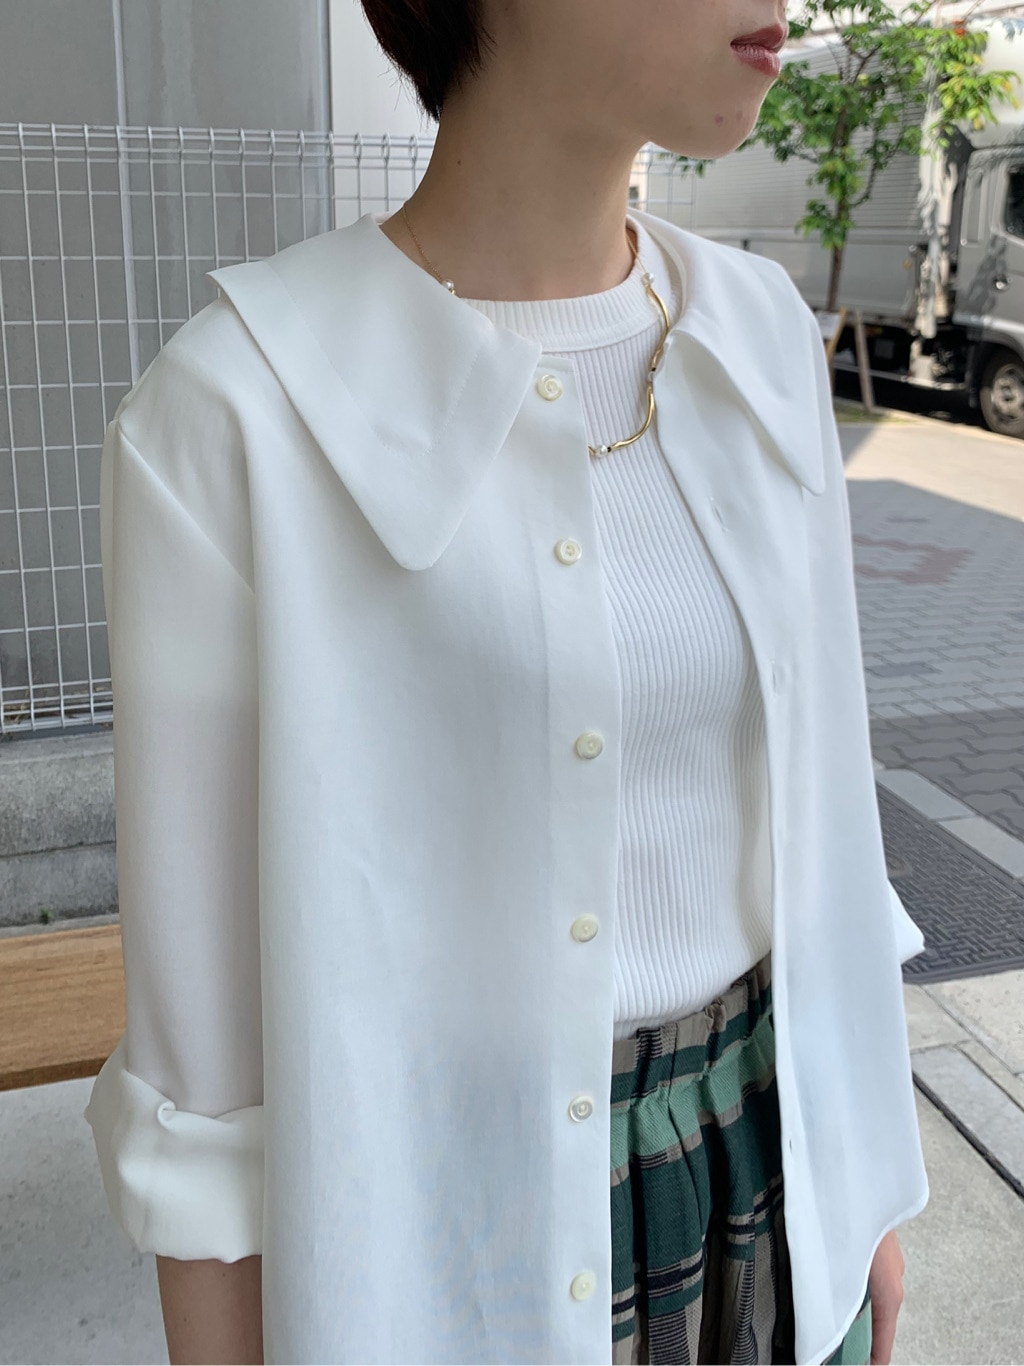 l'atelier du savon 名古屋栄路面 身長:161cm 2020.05.11